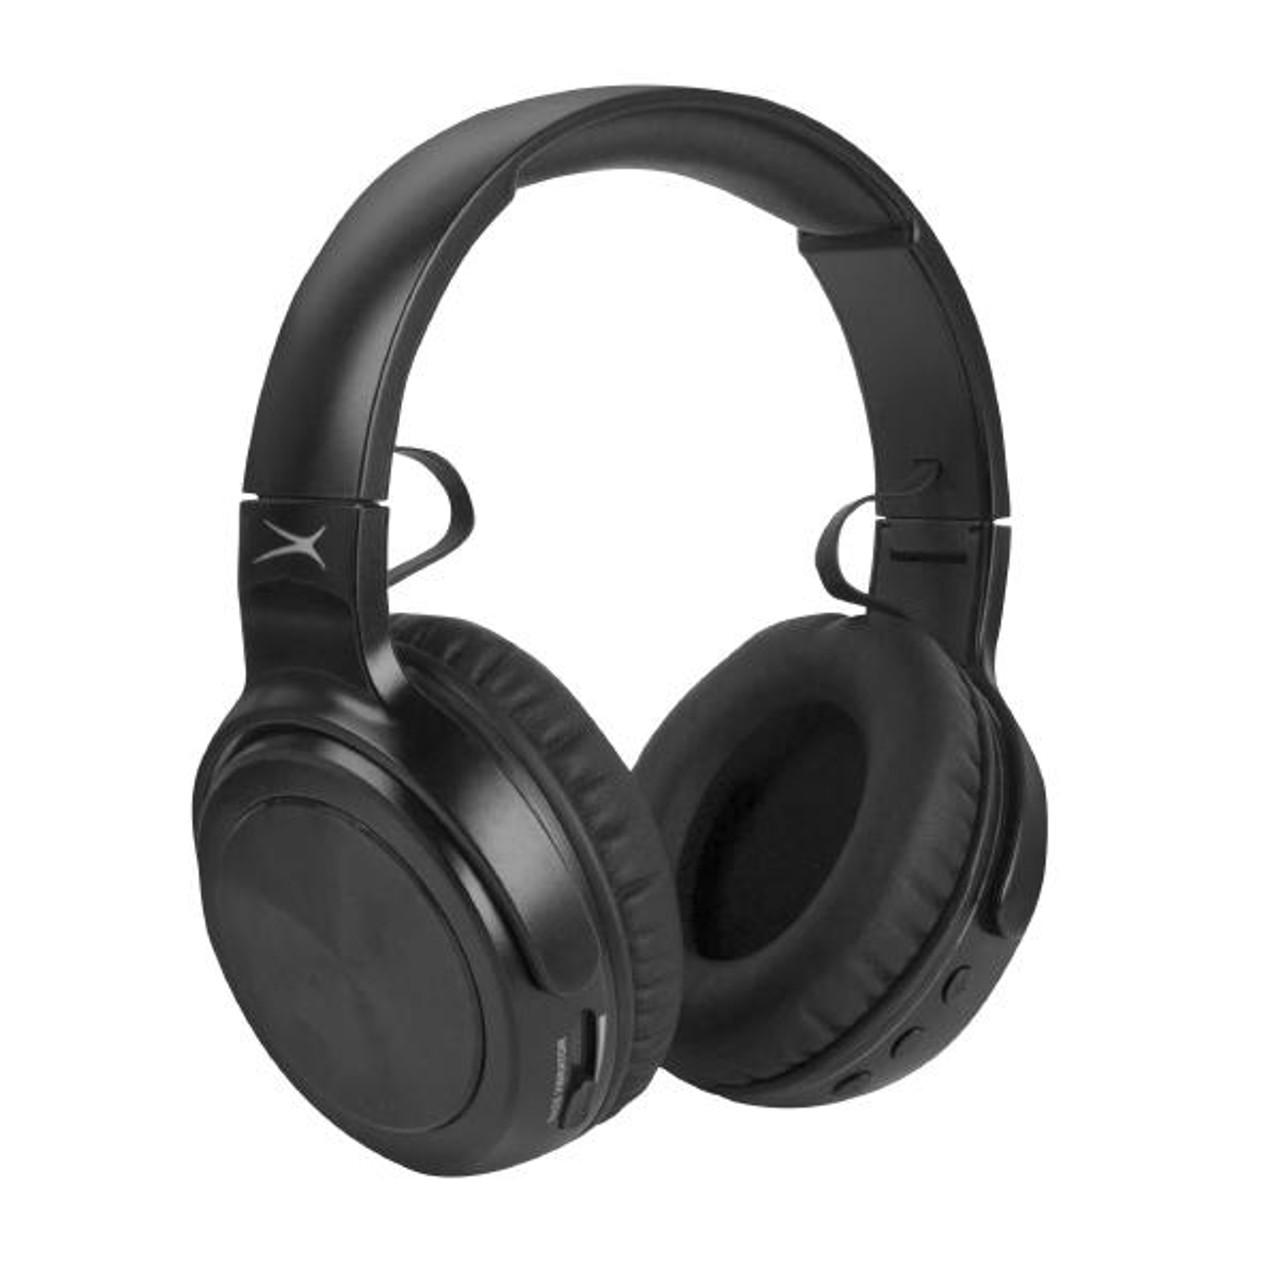 Altec Lansing Rumble Bluetooth Headphones - Over-the-Head Headphones  (Wireless Bluetooth, 10 hrs Battery)